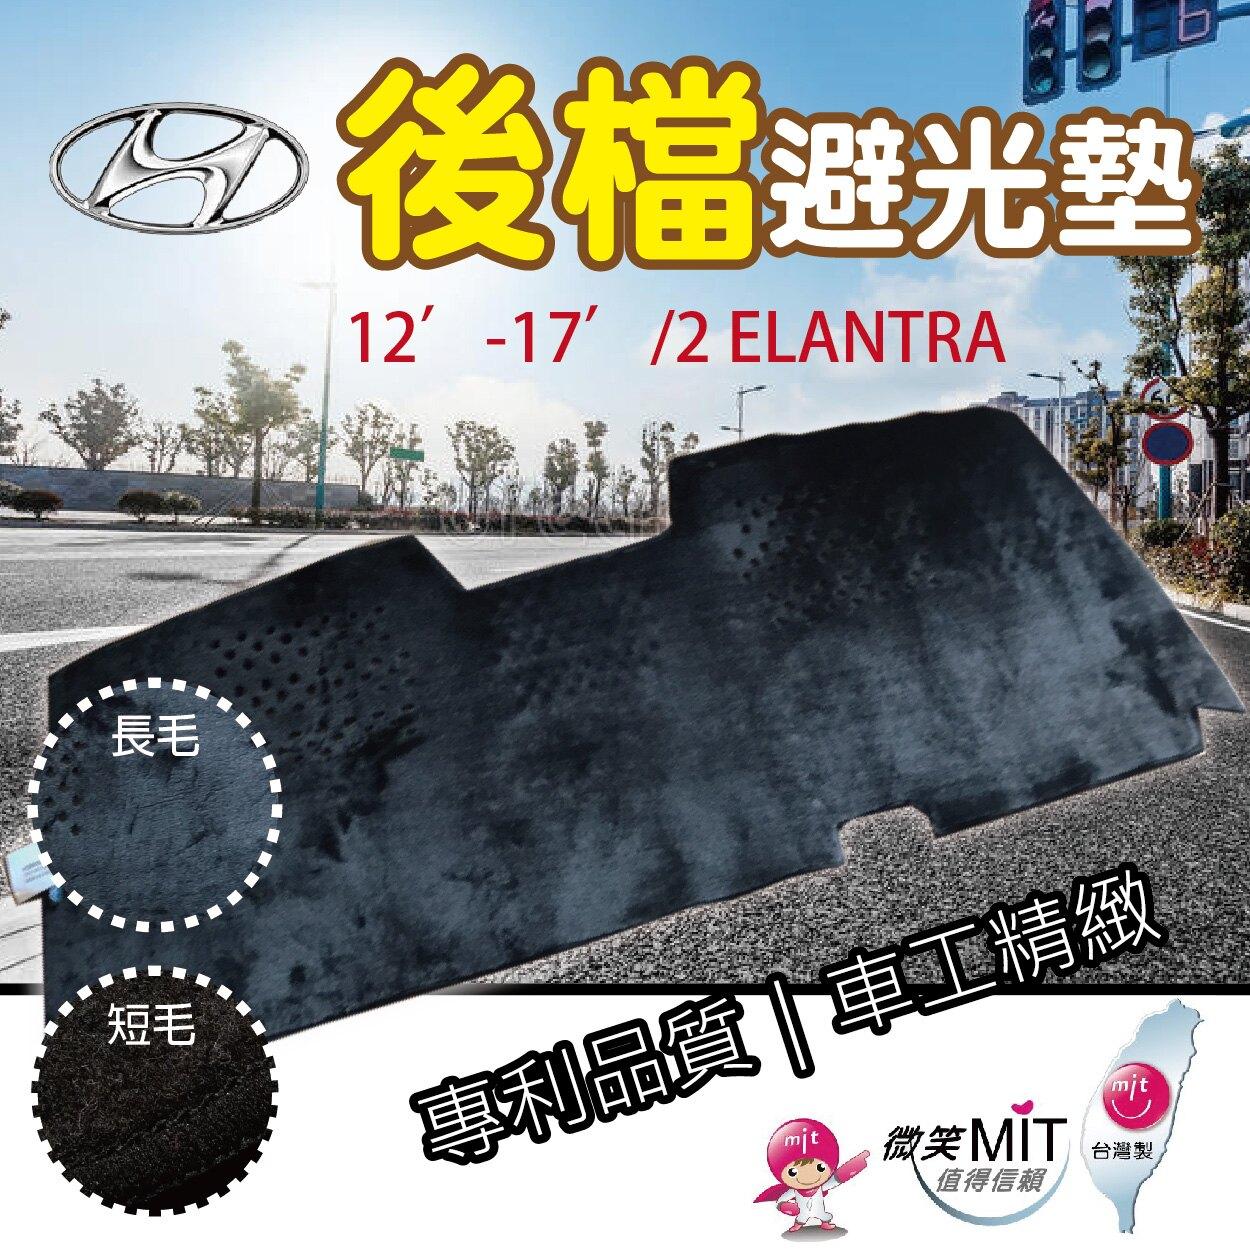 e系列現代 Hyundai 【12'-17'/2 ELANTRA】長毛 短毛 後檔避光墊